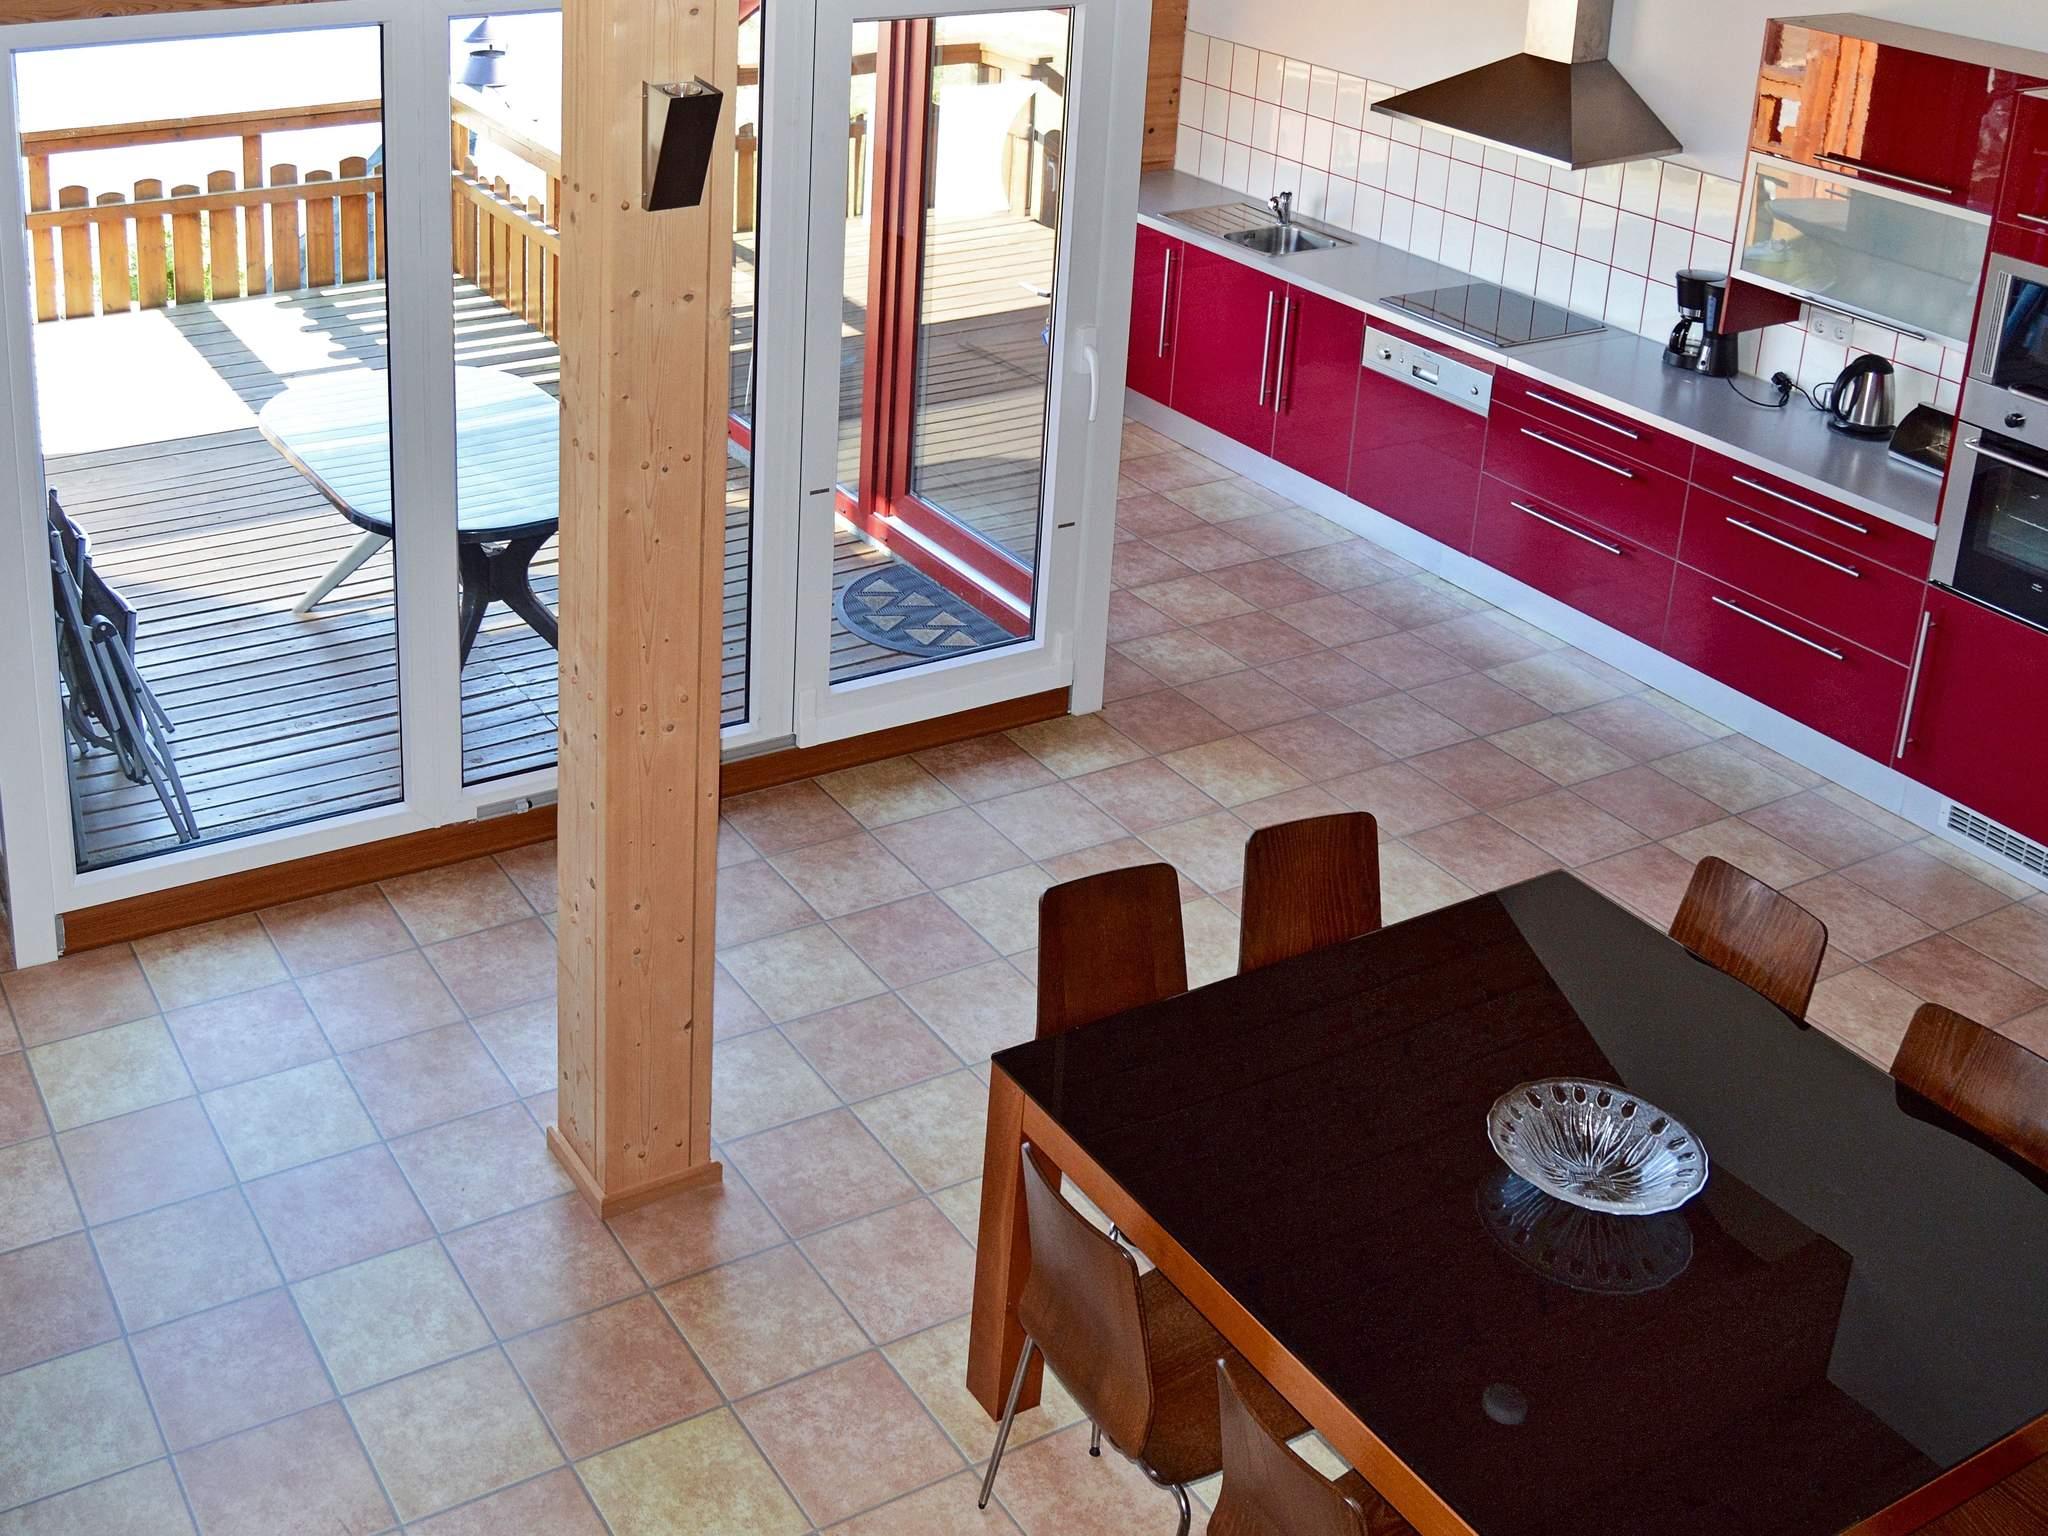 Ferienhaus Eidsvåg (135541), Eidsvåg, More - Romsdal, Westnorwegen, Norwegen, Bild 11